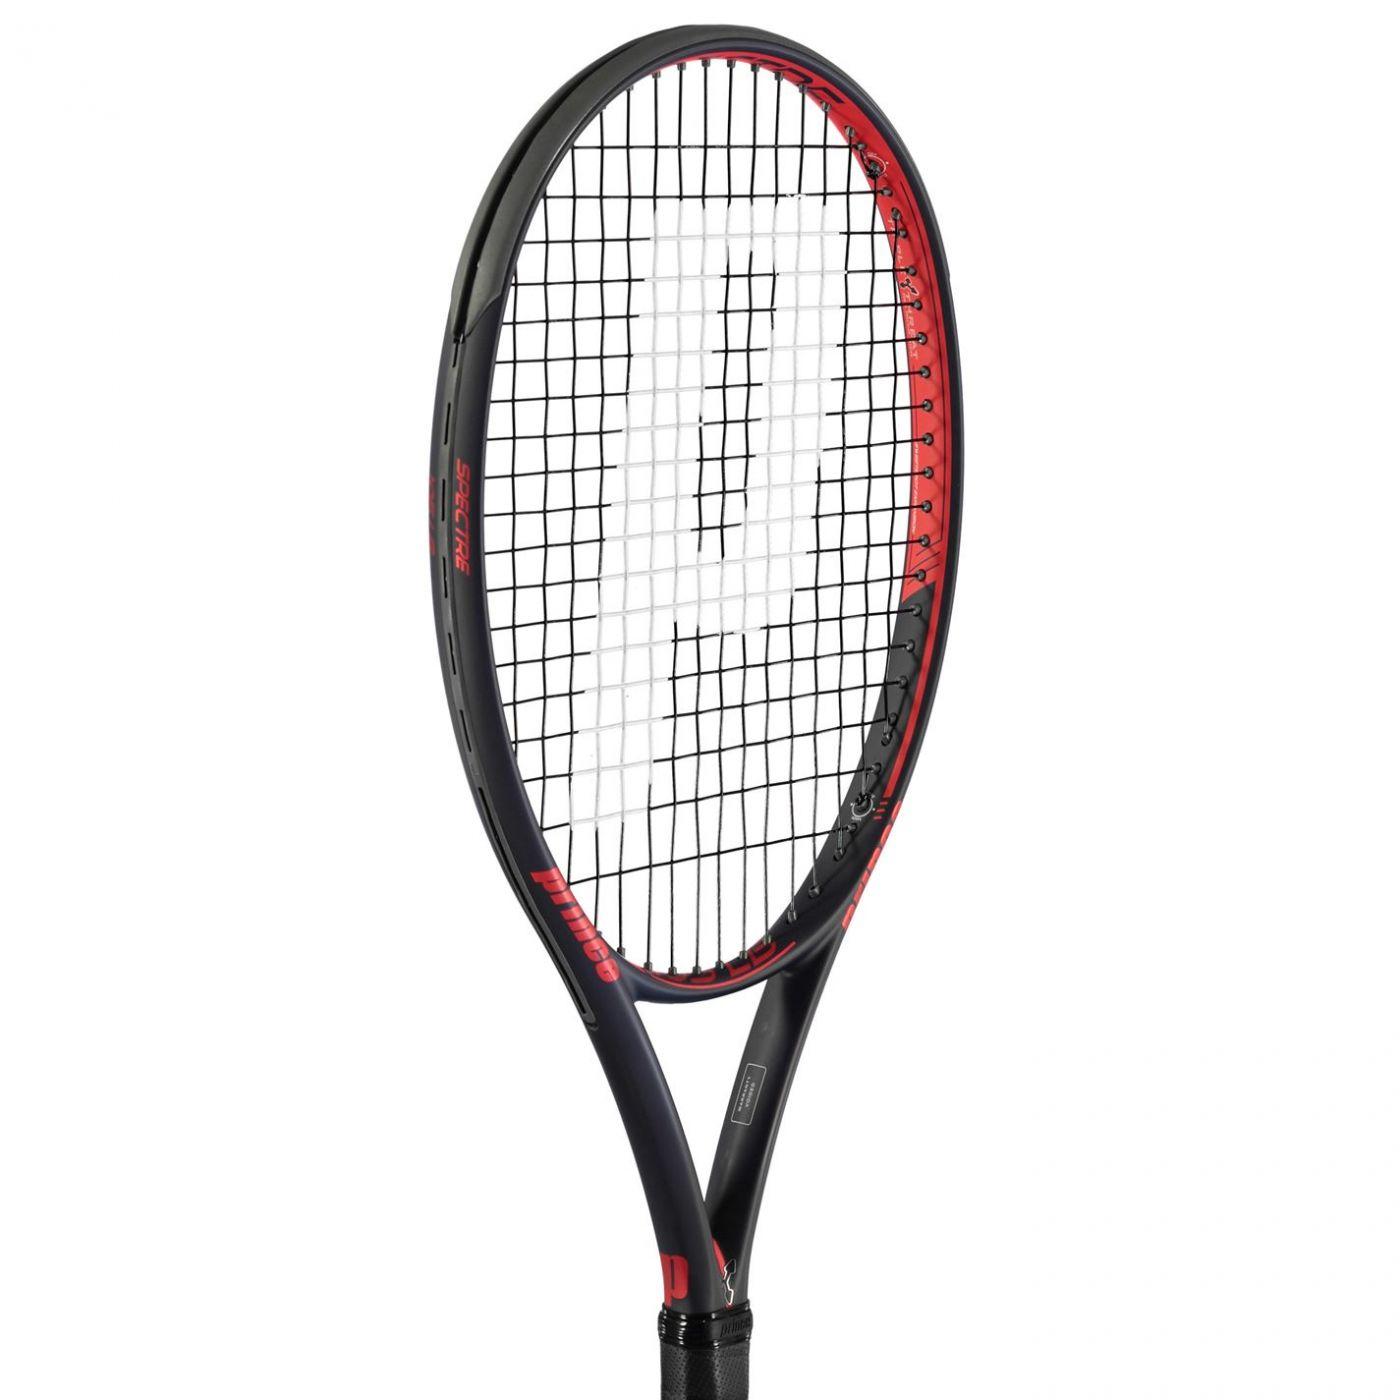 Prince Spectre 105 Tennis Racket